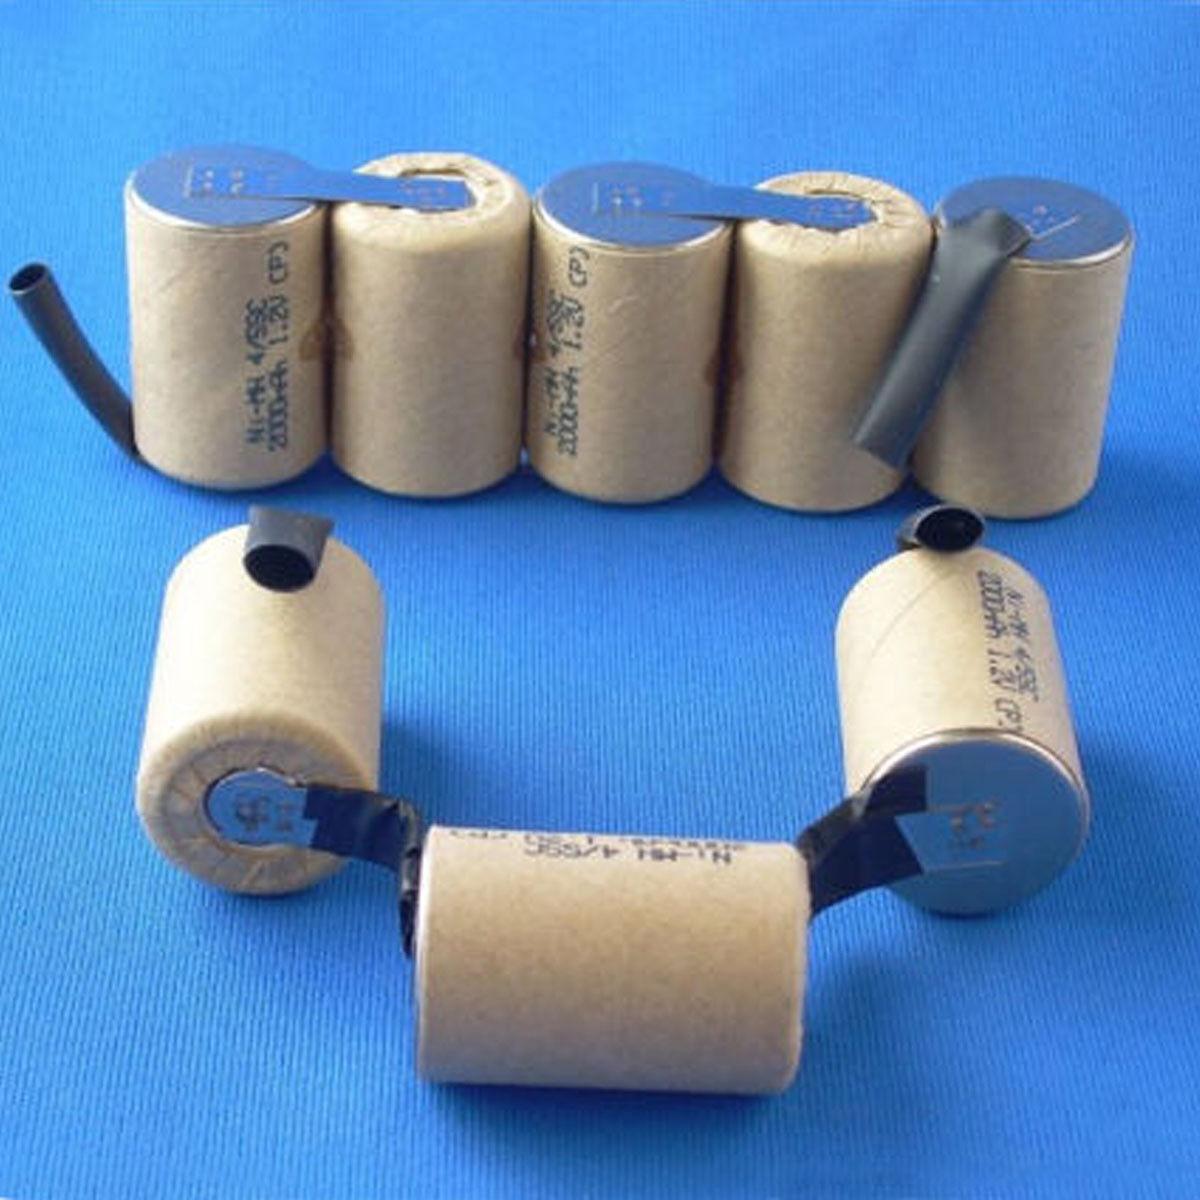 Battery Rebuild Pack For Electrolux Ergorapido 9.6V 2.0Ah 2000mah NI-MH